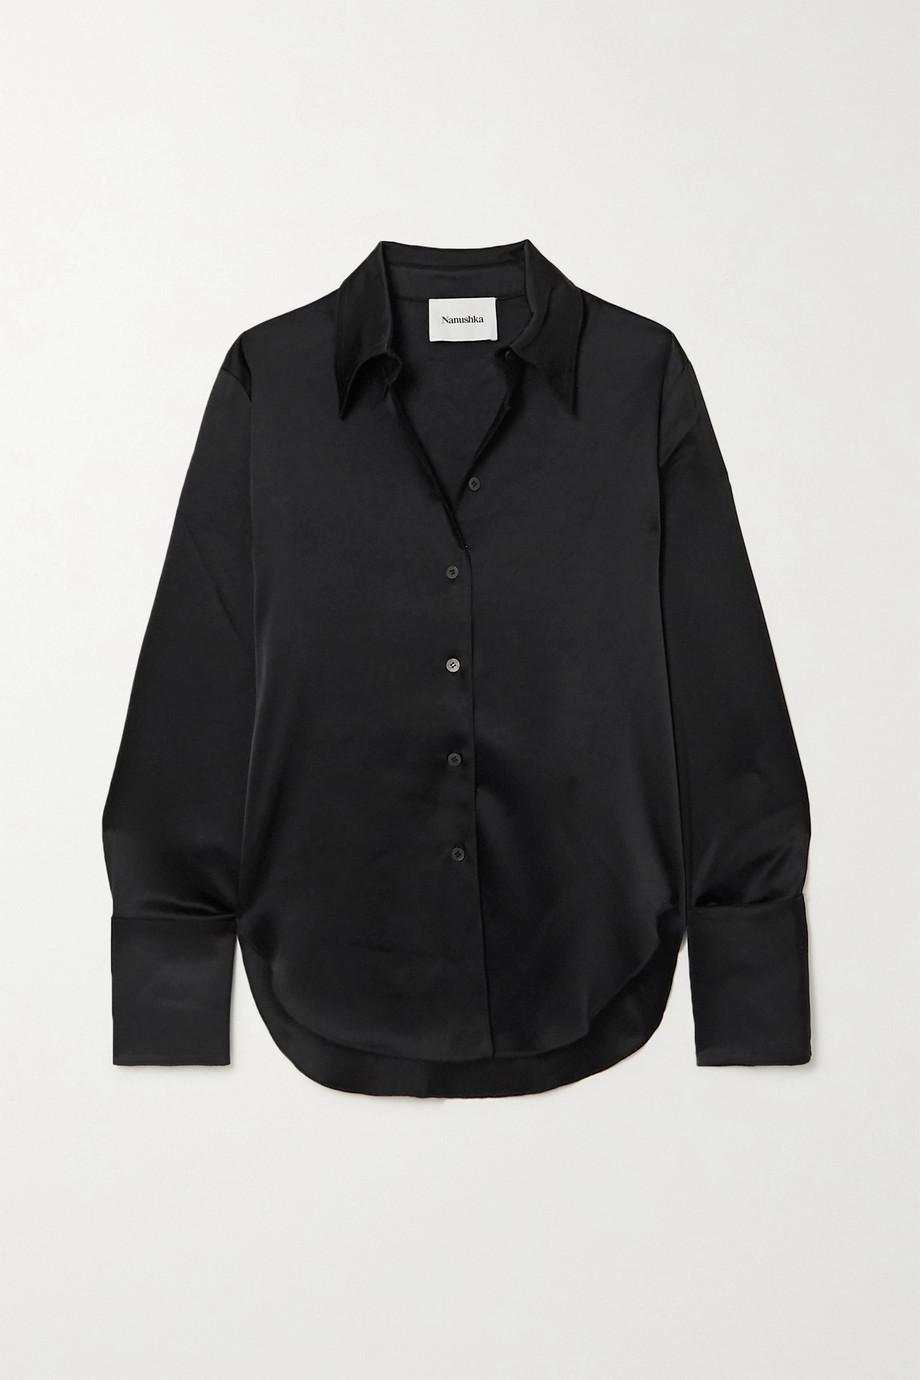 Nanushka + NET SUSTAIN Mandine satin shirt